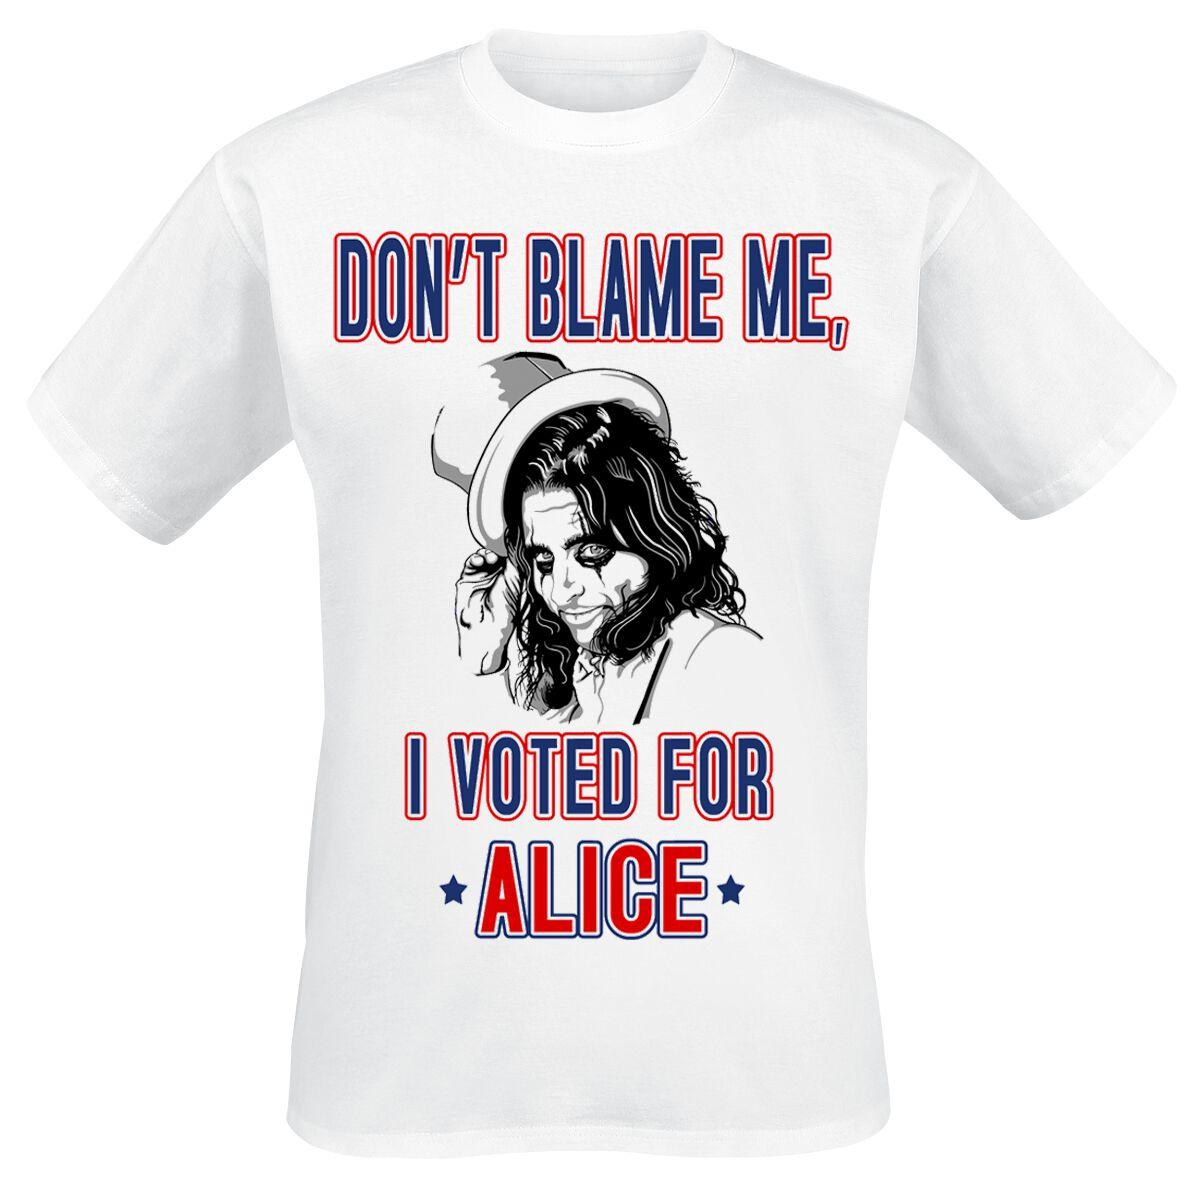 Zespoły - Koszulki - T-Shirt Alice Cooper Don't Blame Me T-Shirt biały - 359876